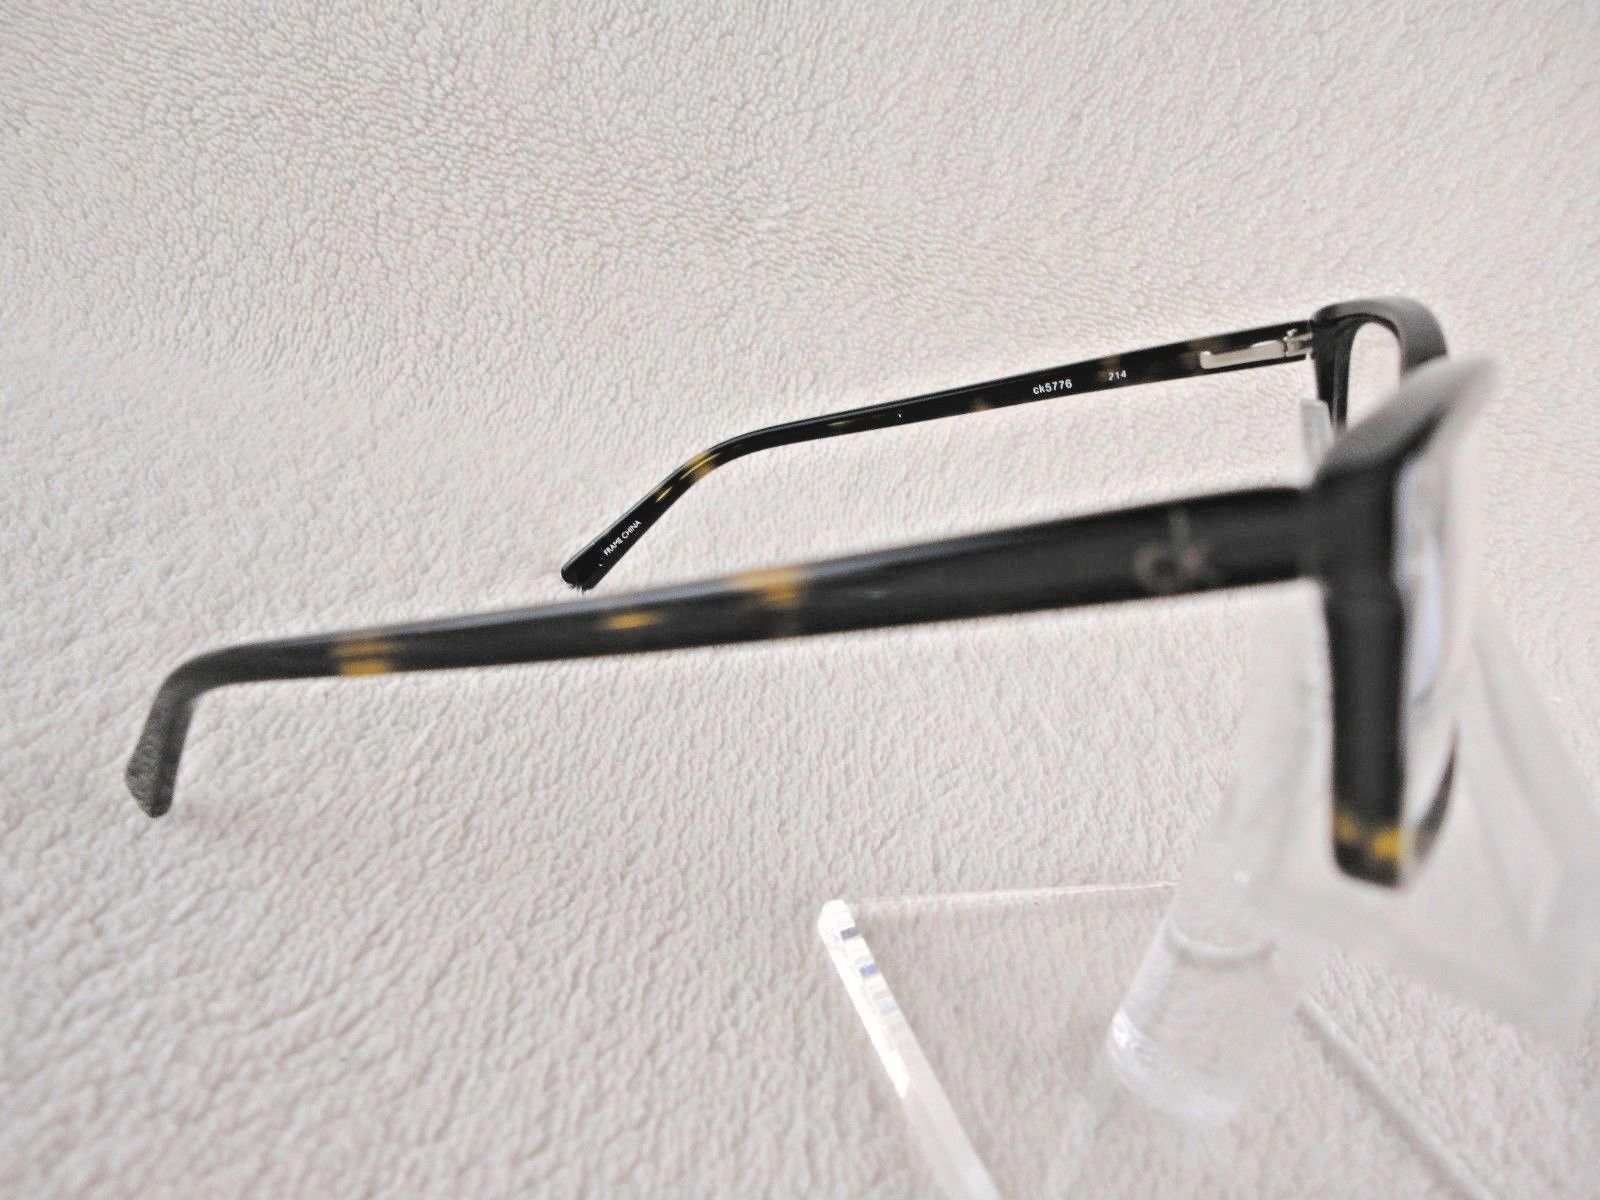 Calvin Klein Ck 5776 (214) Havana 52 X 15 135 mm Eyeglass Frame